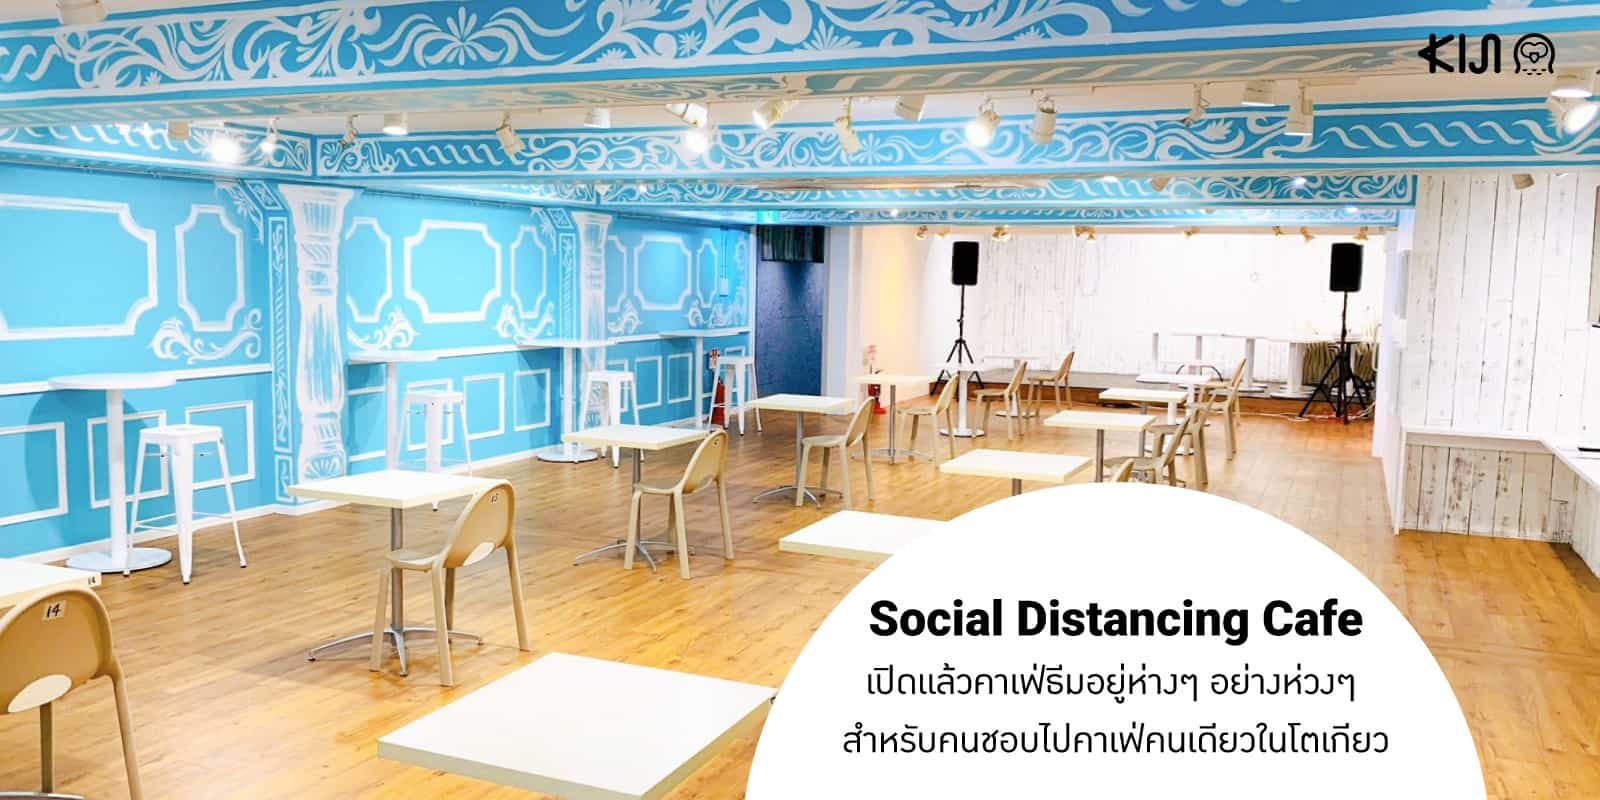 Social Distancing Cafe เปิดแล้วคาเฟ่ธีมอยู่ห่างๆ อย่างห่วงๆ สำหรับคนชอบไปคาเฟ่คนเดียวในโตเกียว